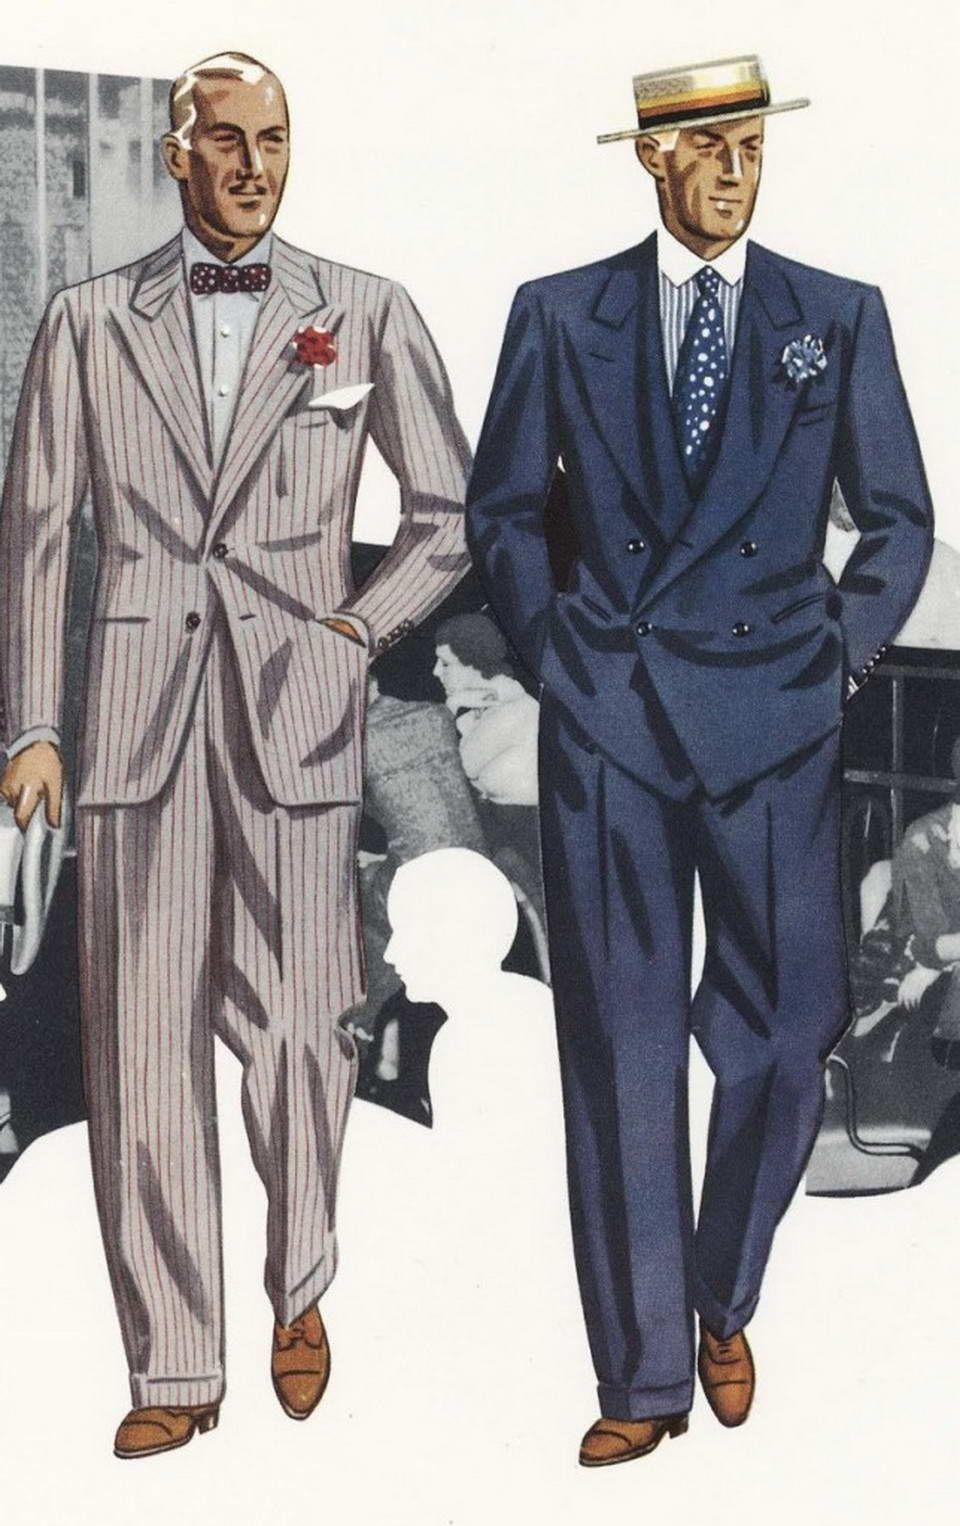 Pochwal Sie Swoja Stylizacja Vintage Clothing Men Mens Fashion Illustration Fashion Illustration Vintage